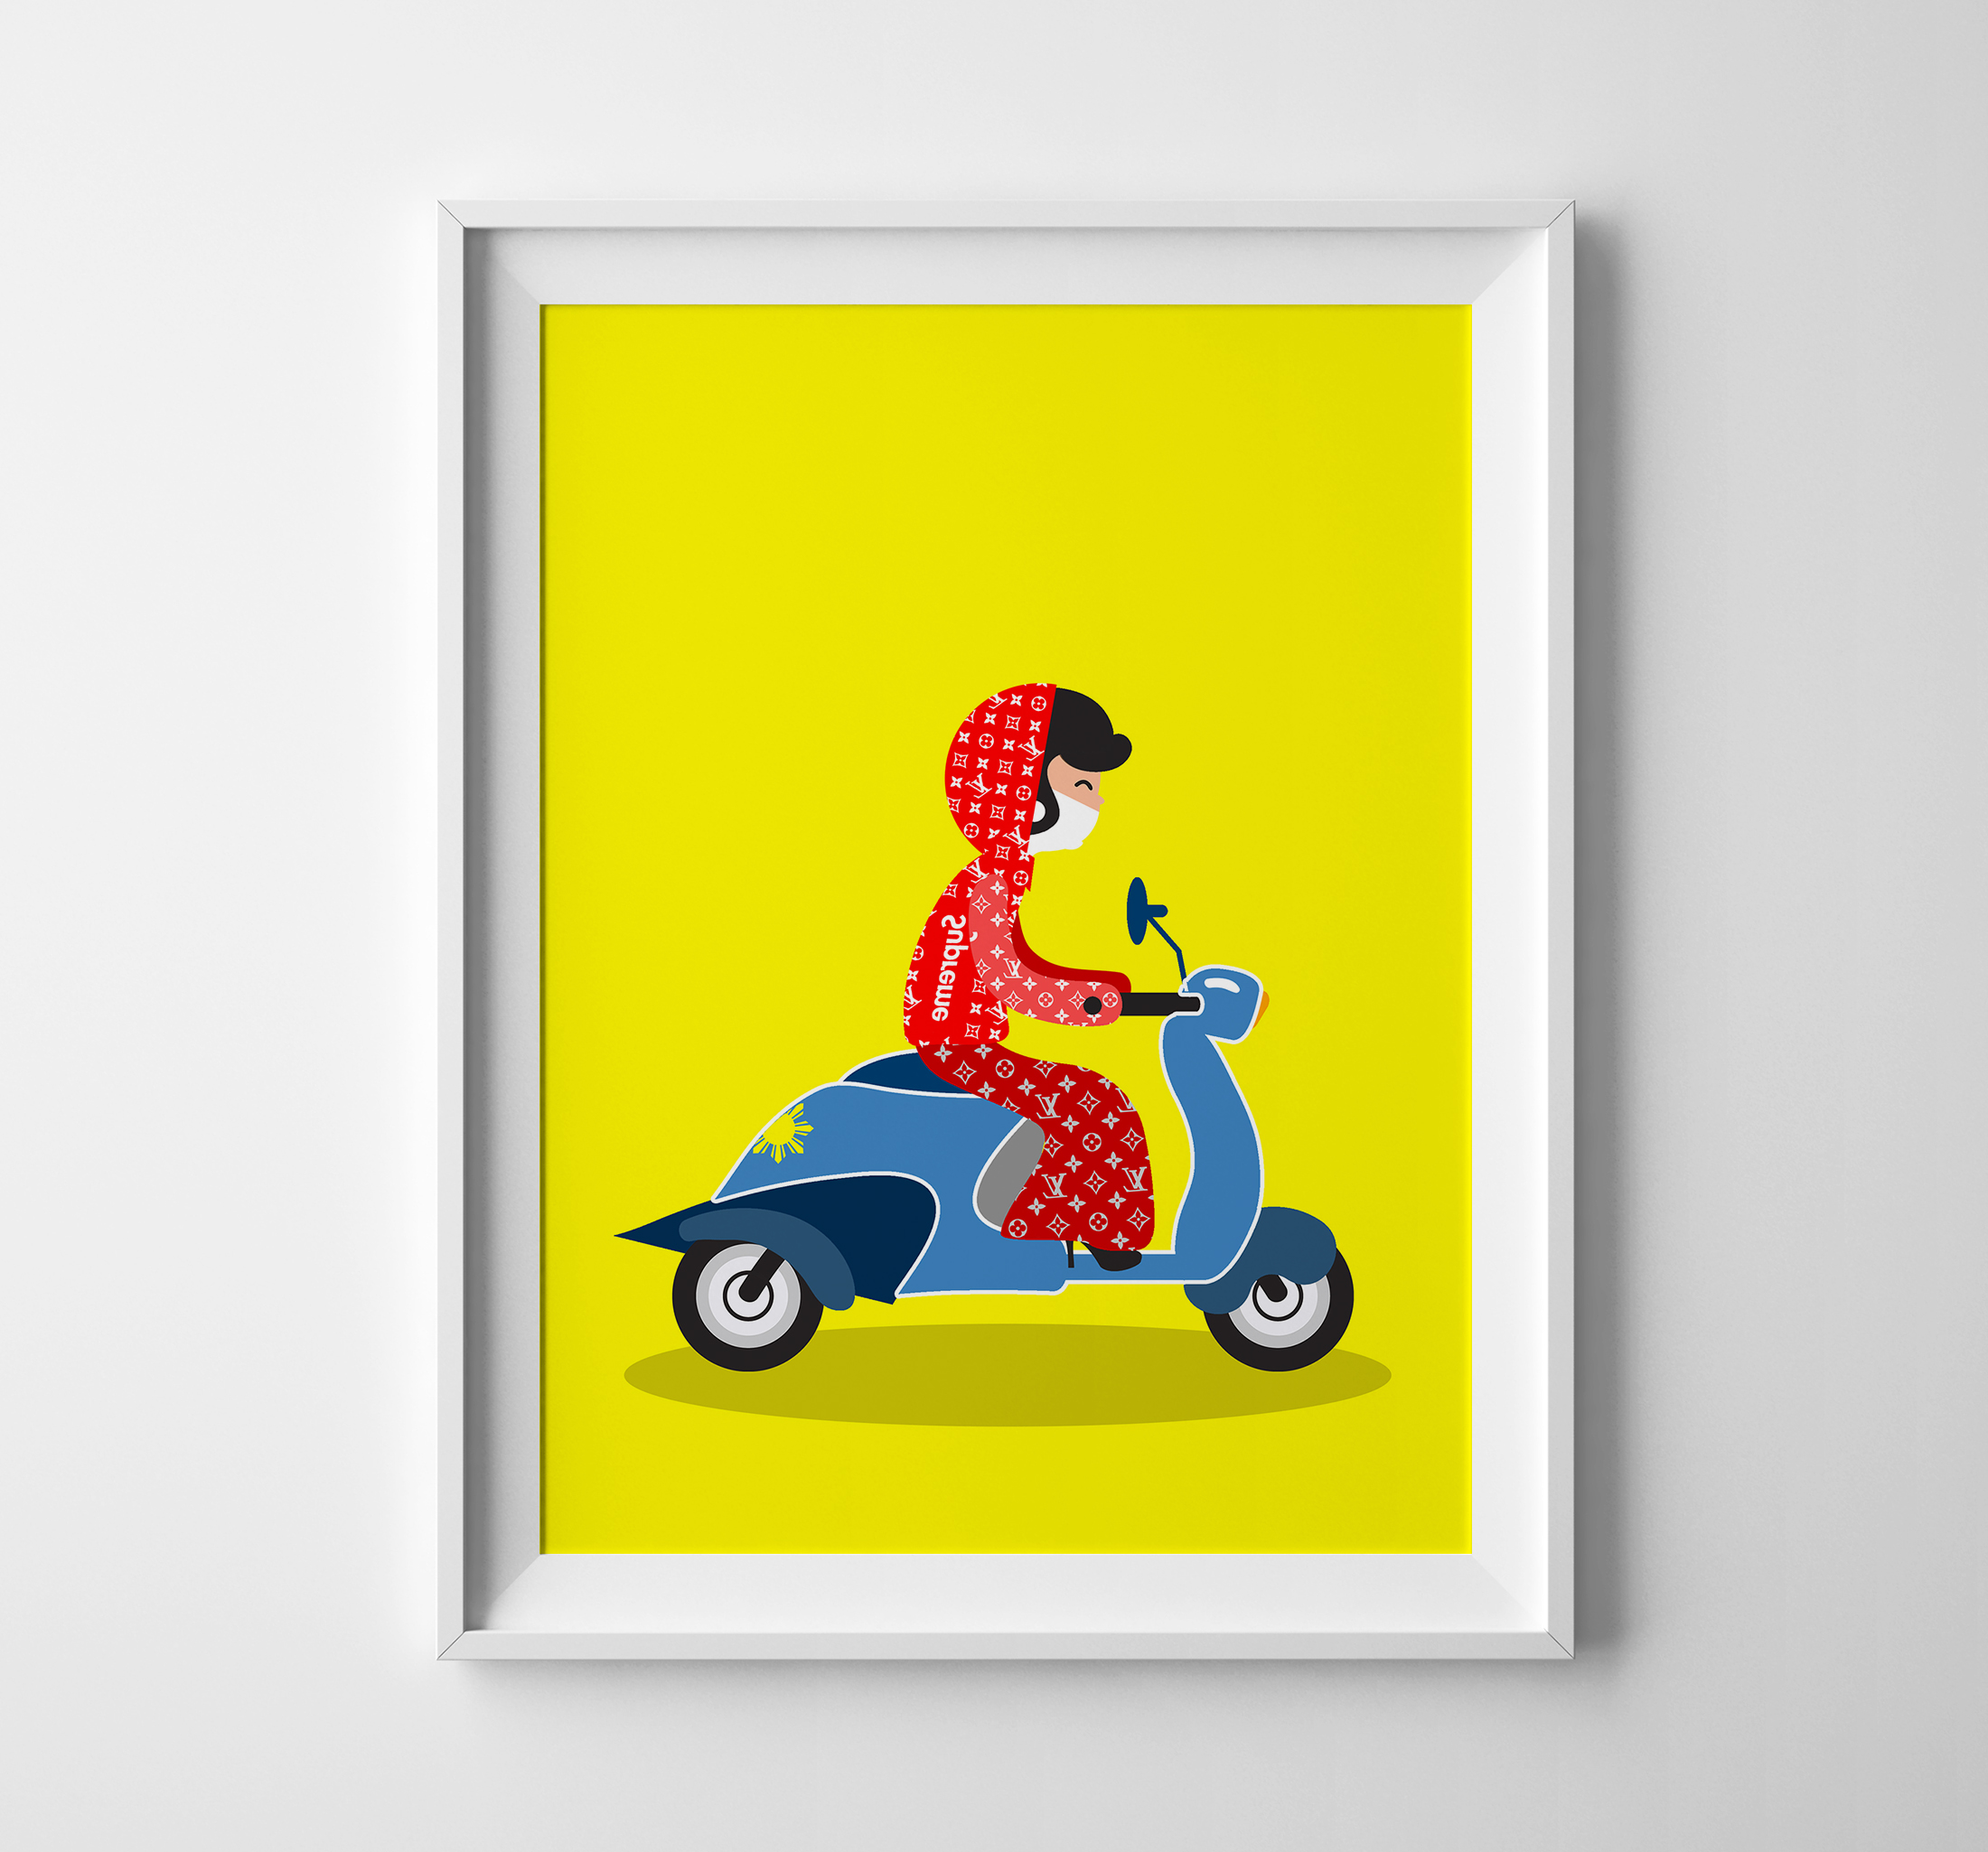 I Illustrate Fashionable Vietnamese Female Bikers